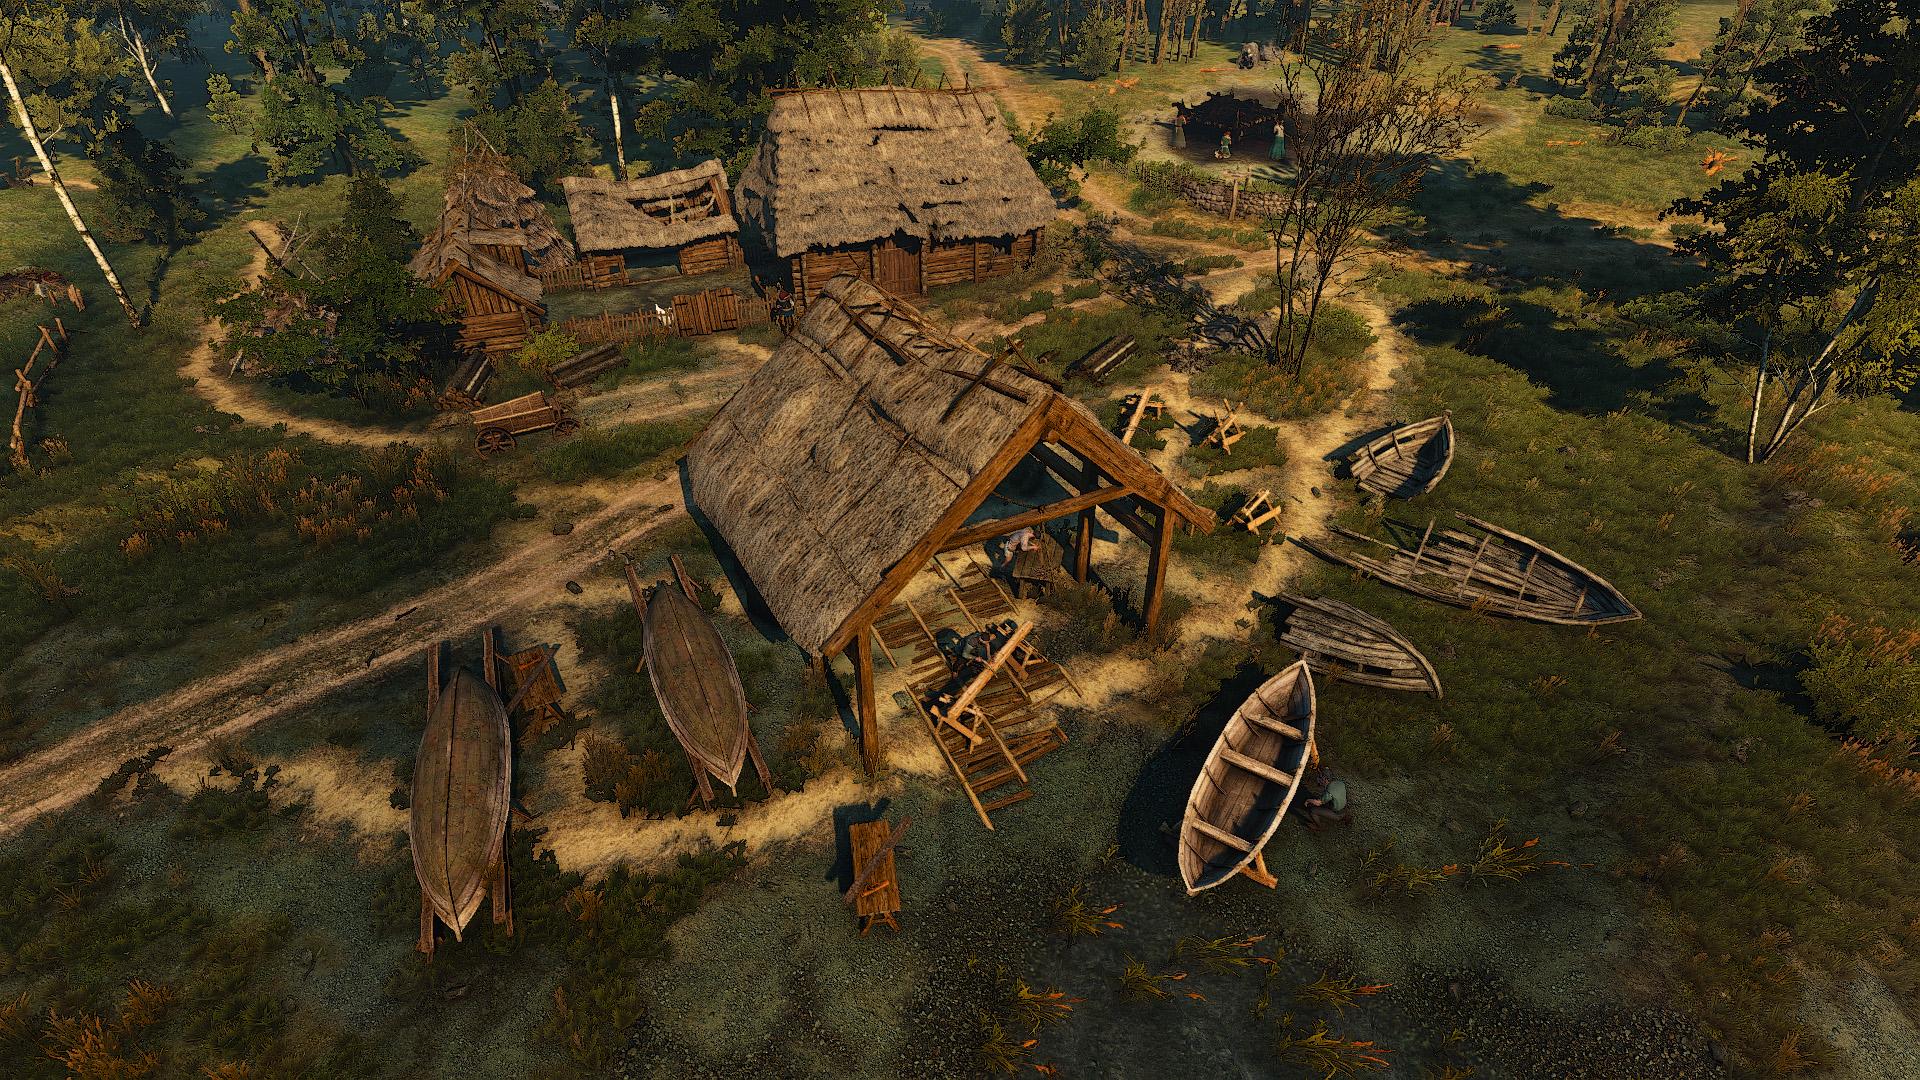 Boatmakers' Hut